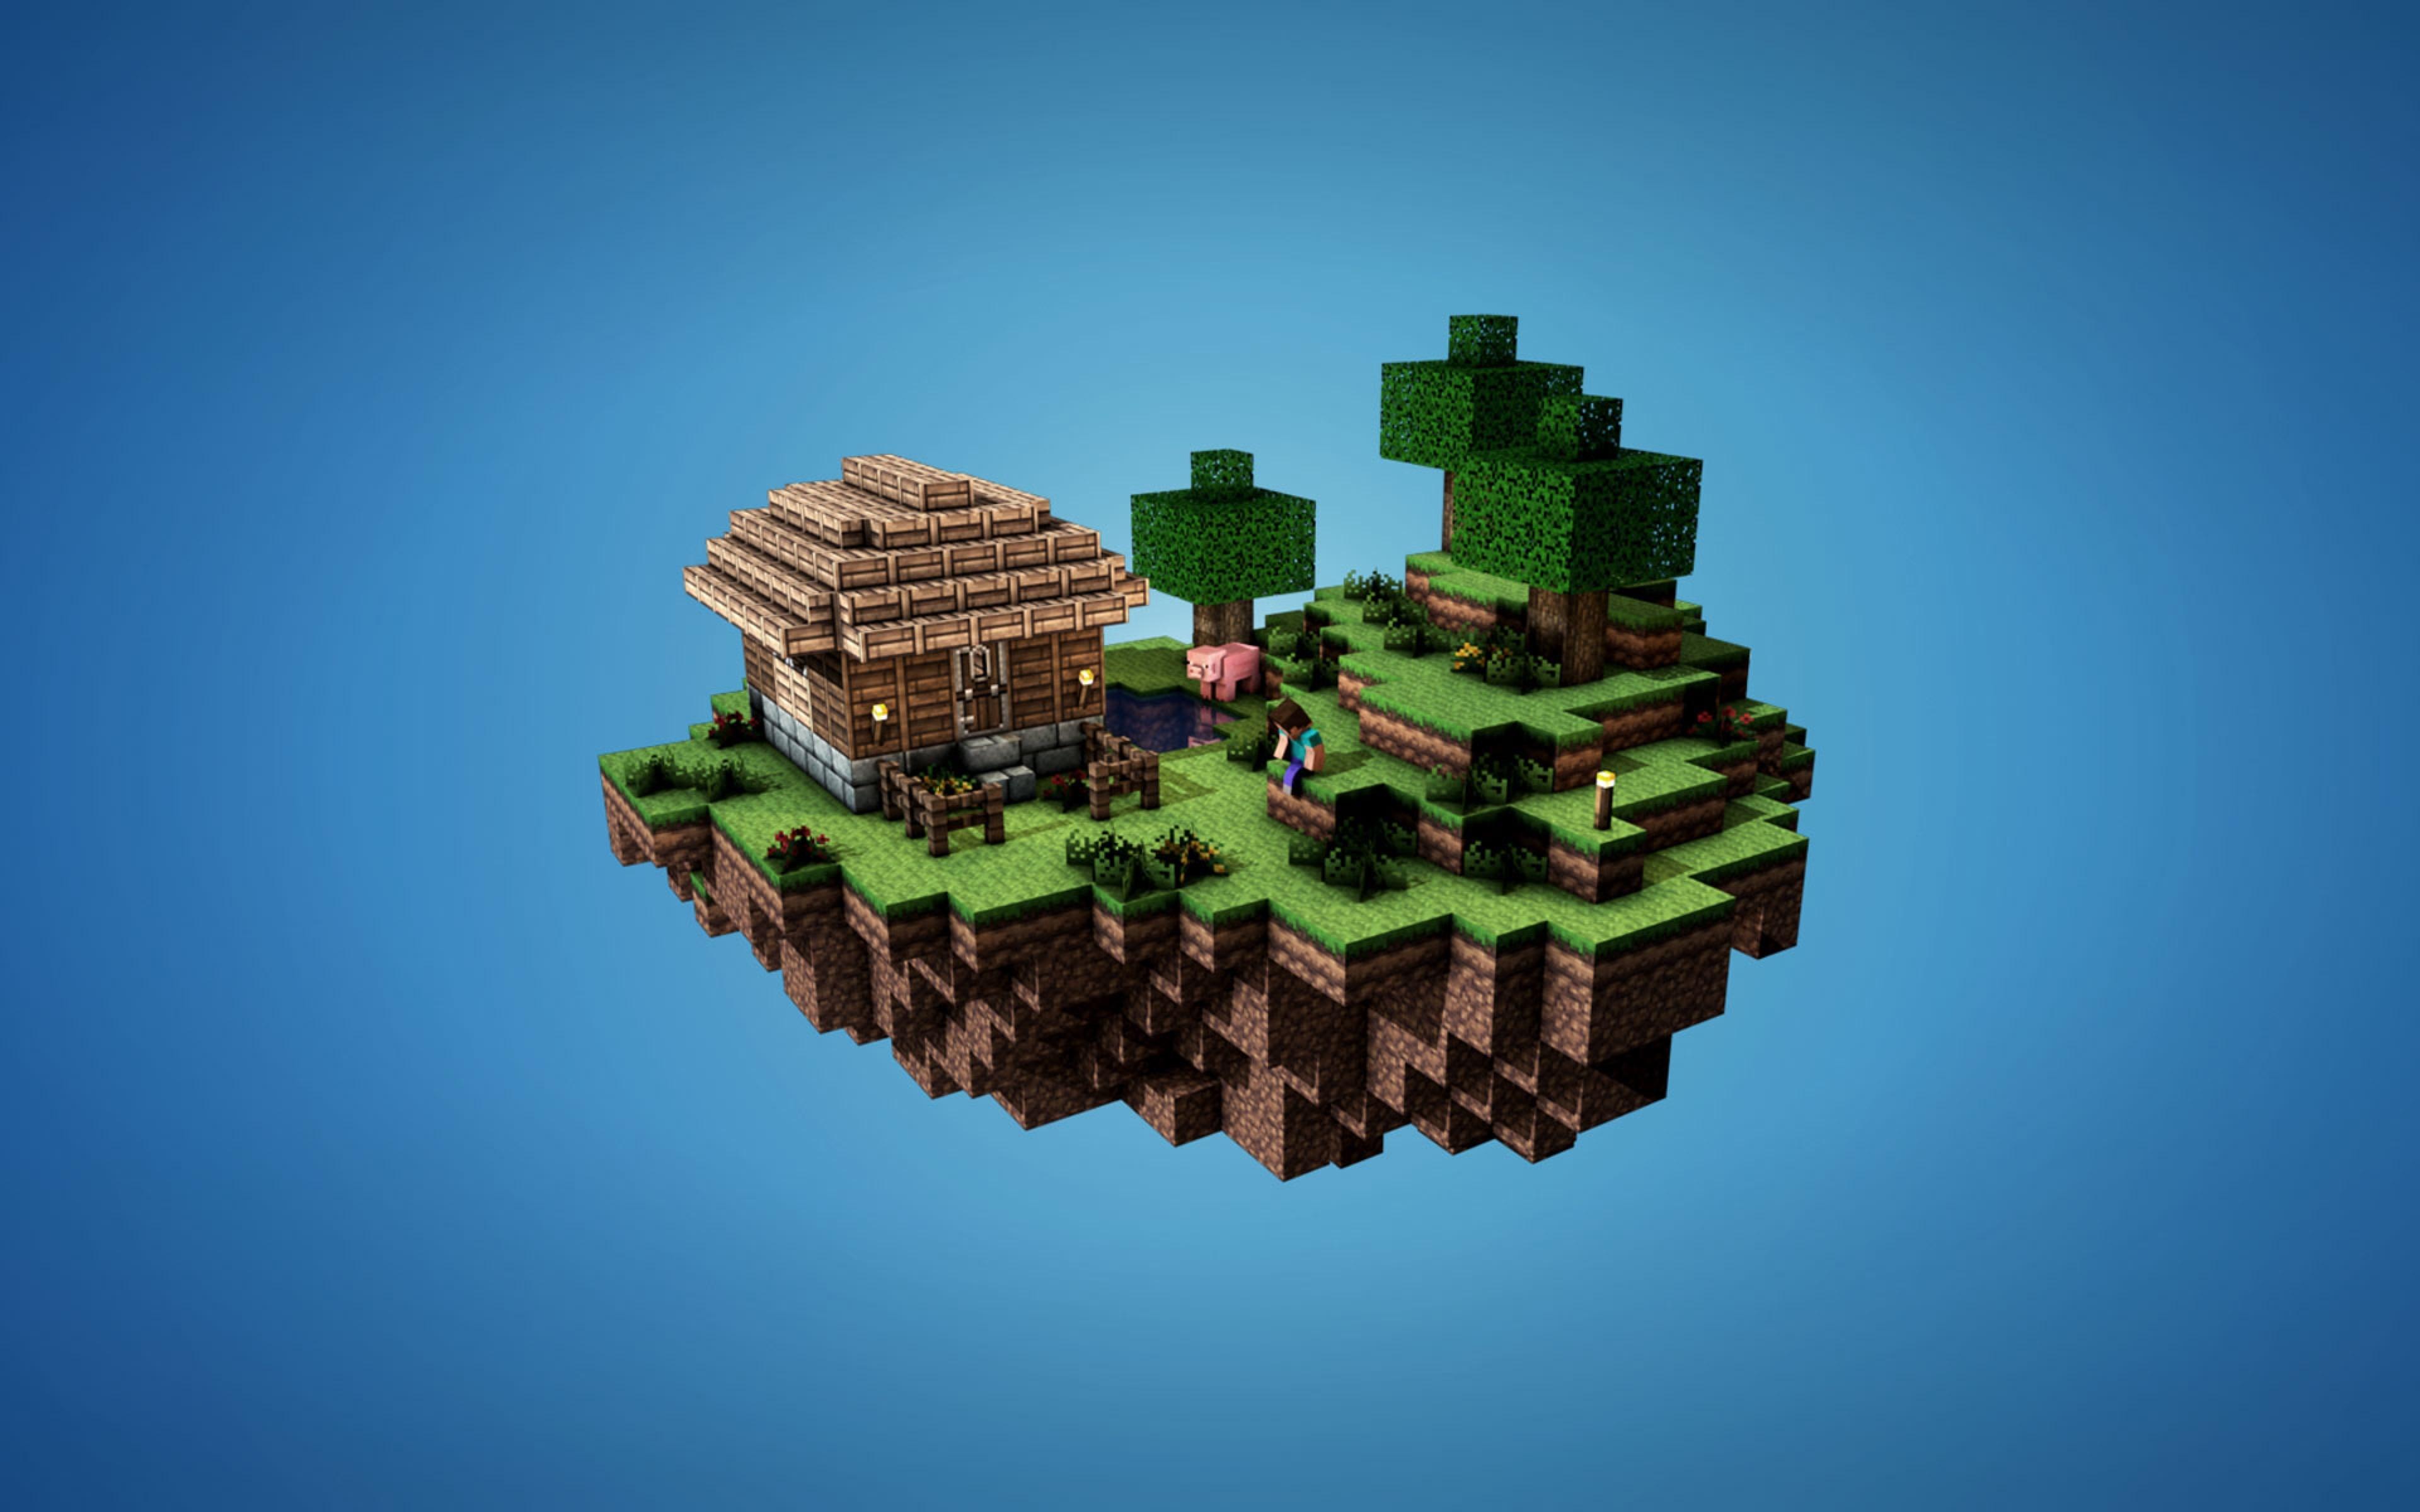 Minecraft Box 3D Game Wallpaper Images HD 8788 Wallpaper 3840x2400